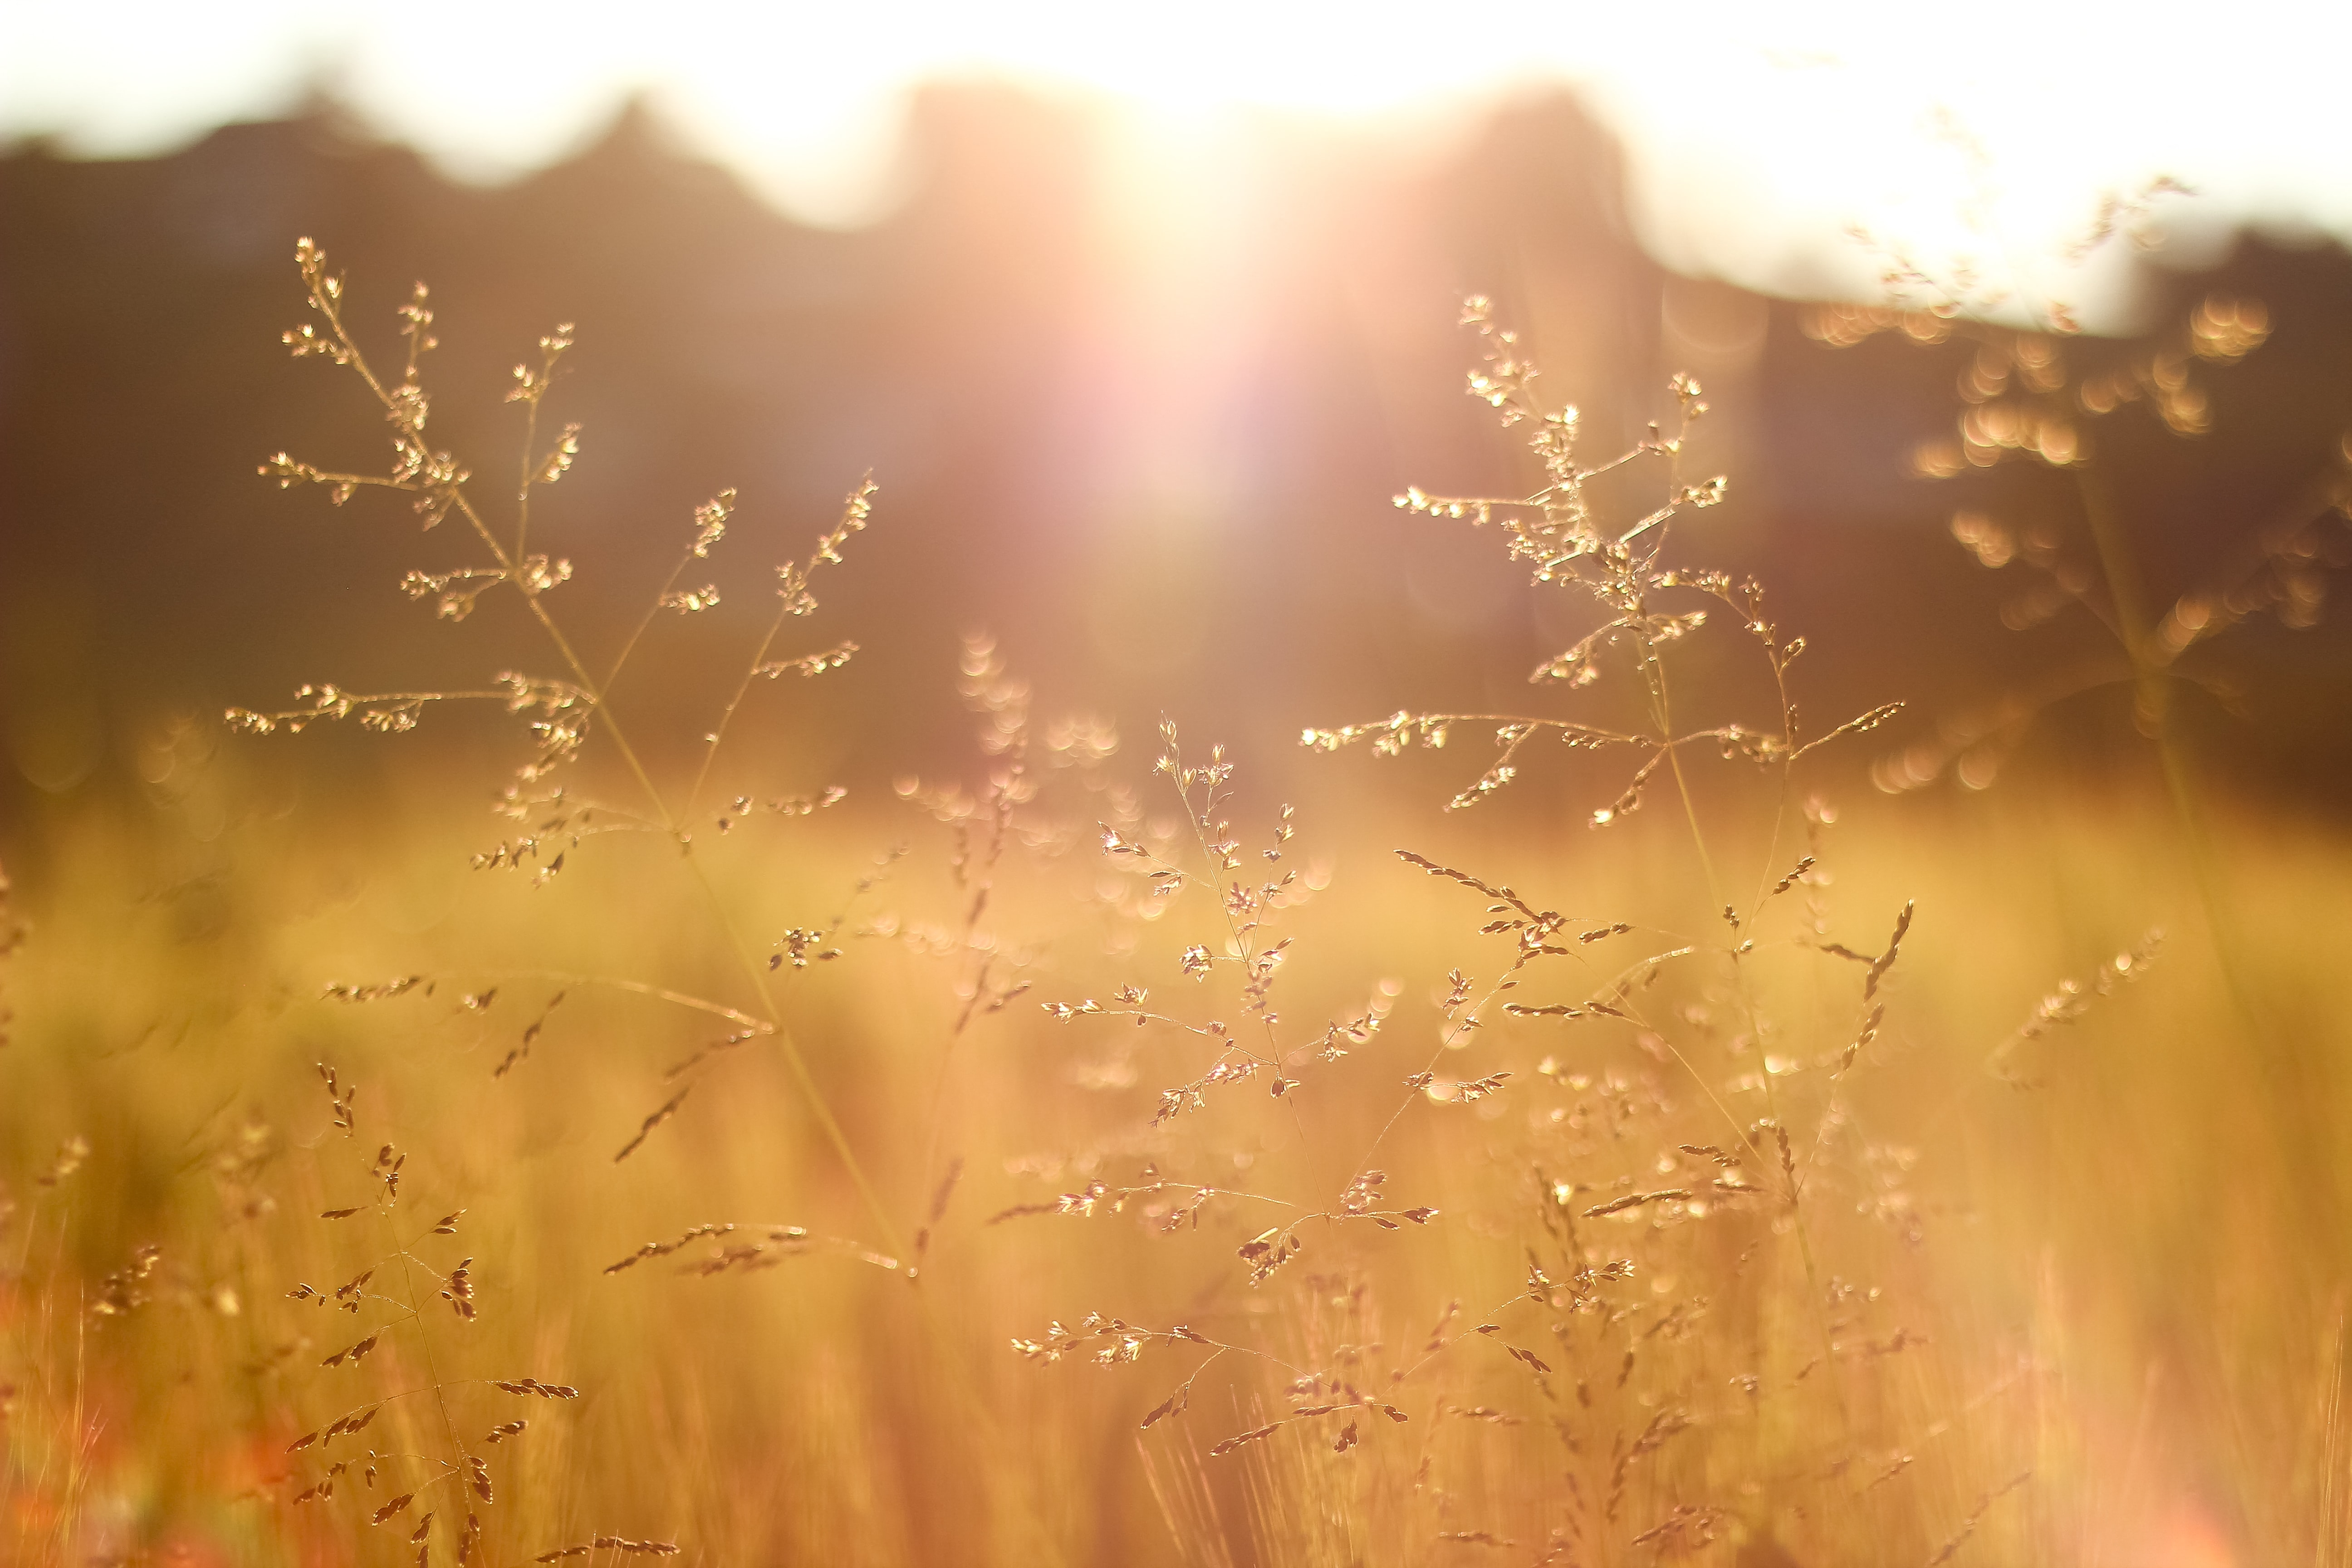 shallow focus photography of grass field